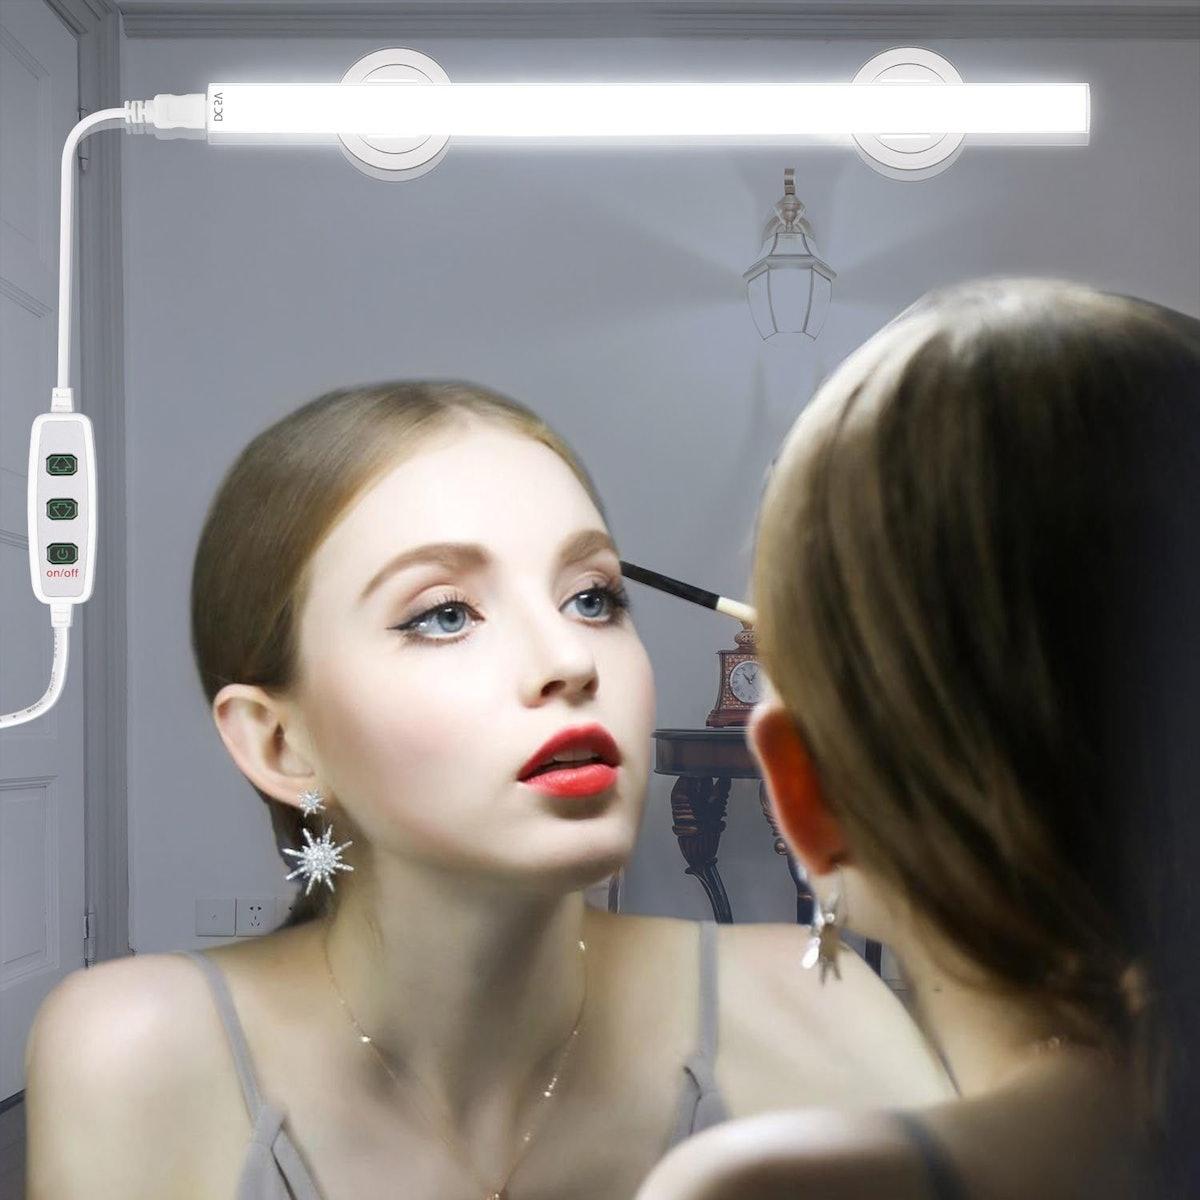 Jayol LED Vanity Mirror Light